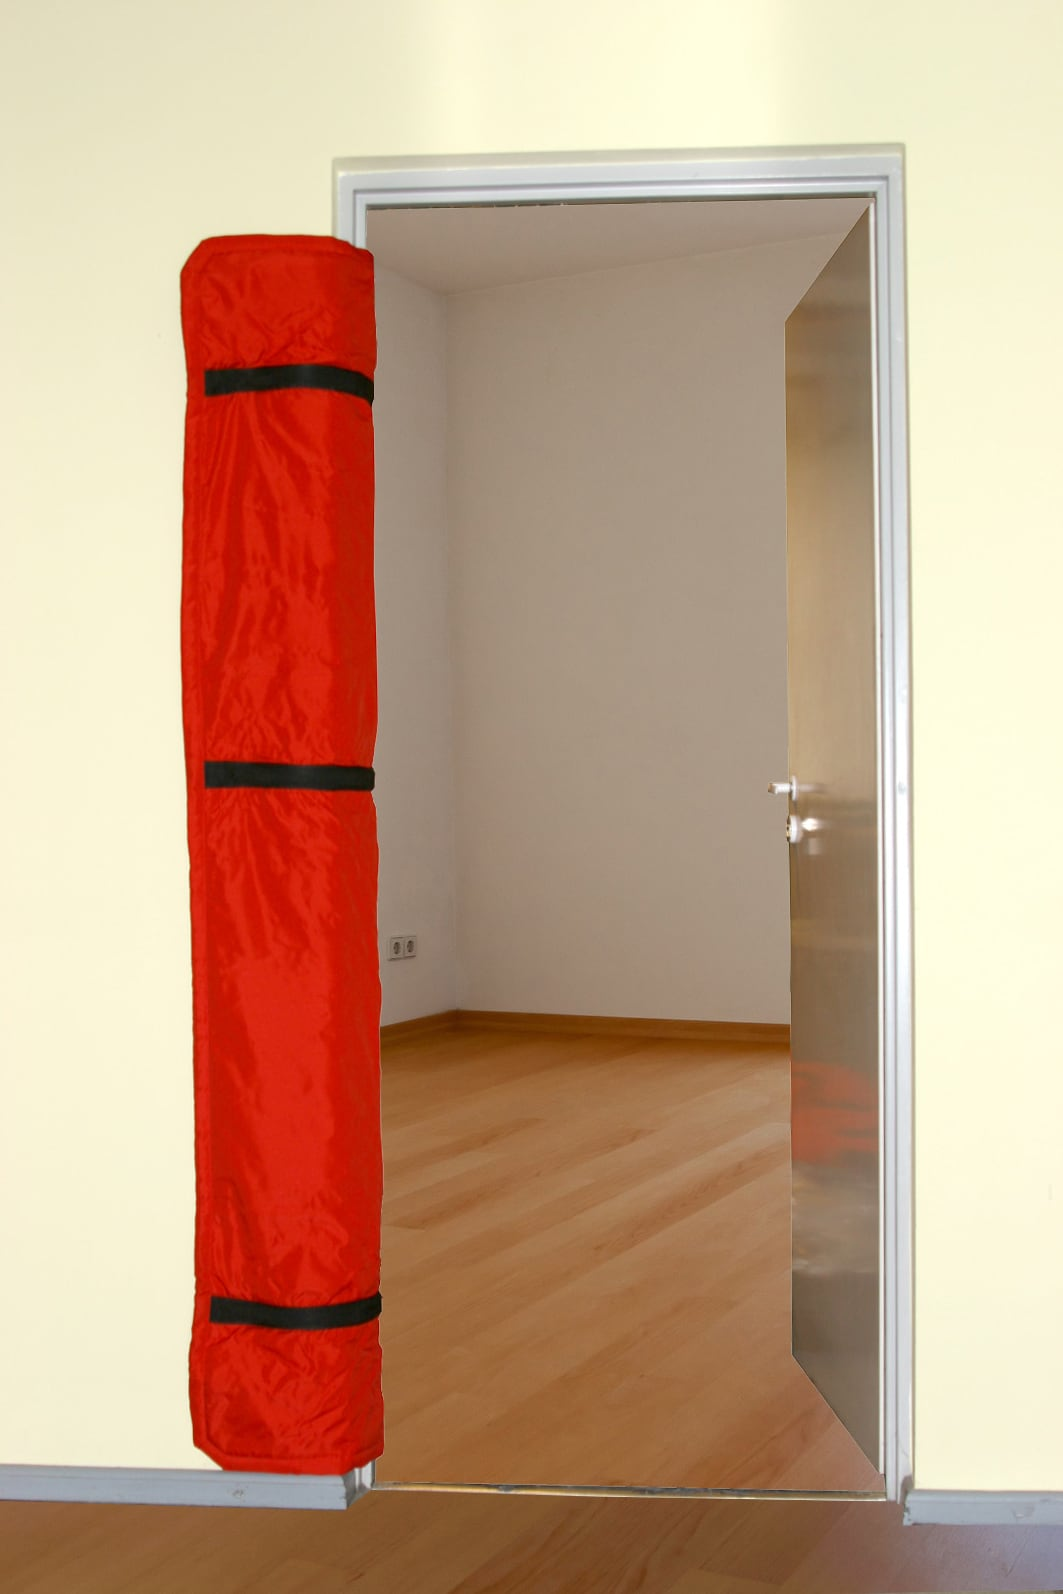 Beschermhoes draagbalk kozijn - 900 x 700mm